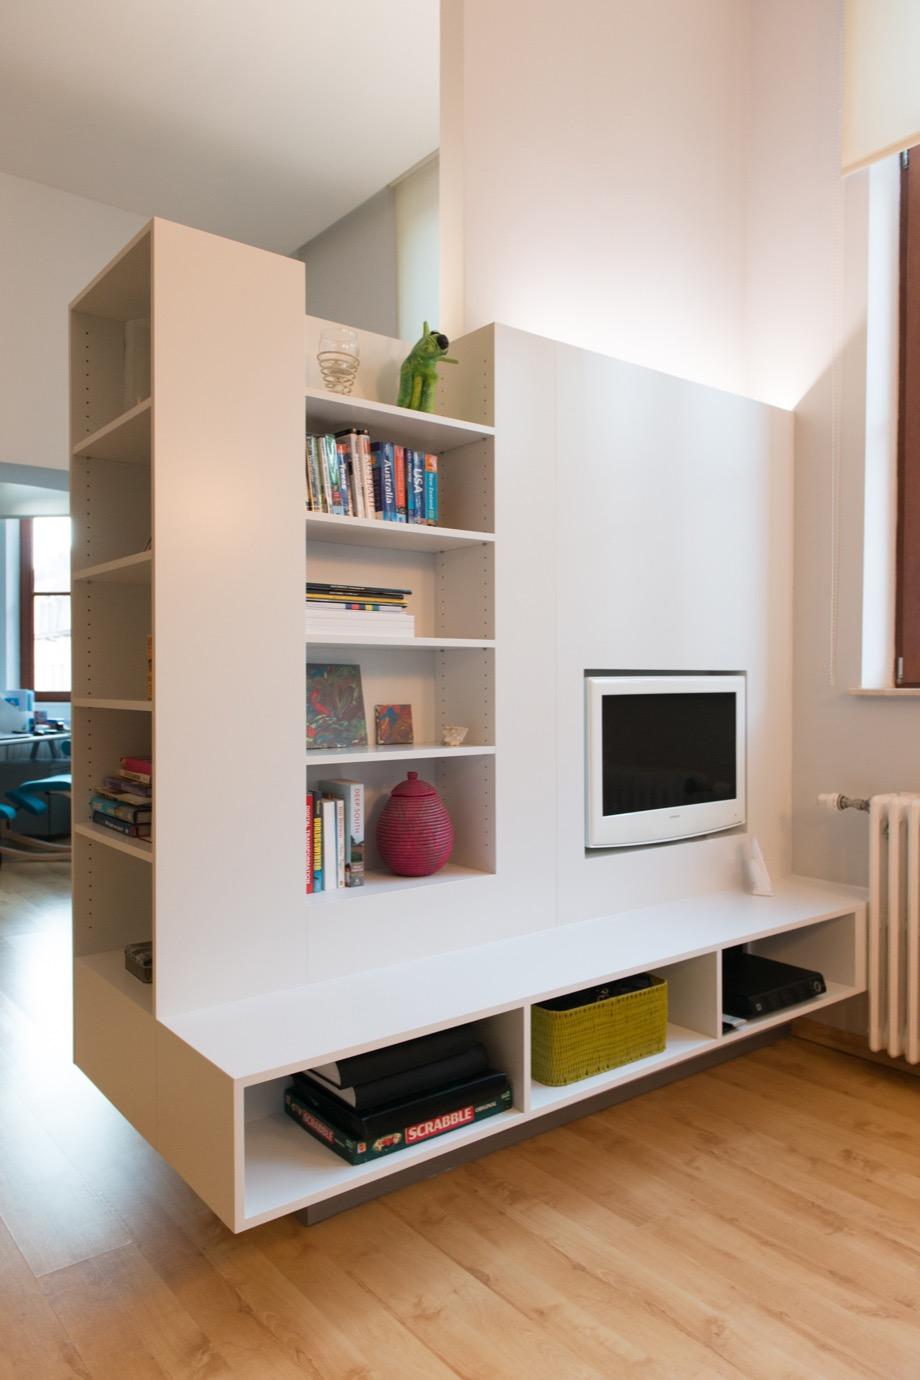 Scheidingswand keuken – zitkamer – Berchem   Kastenlab